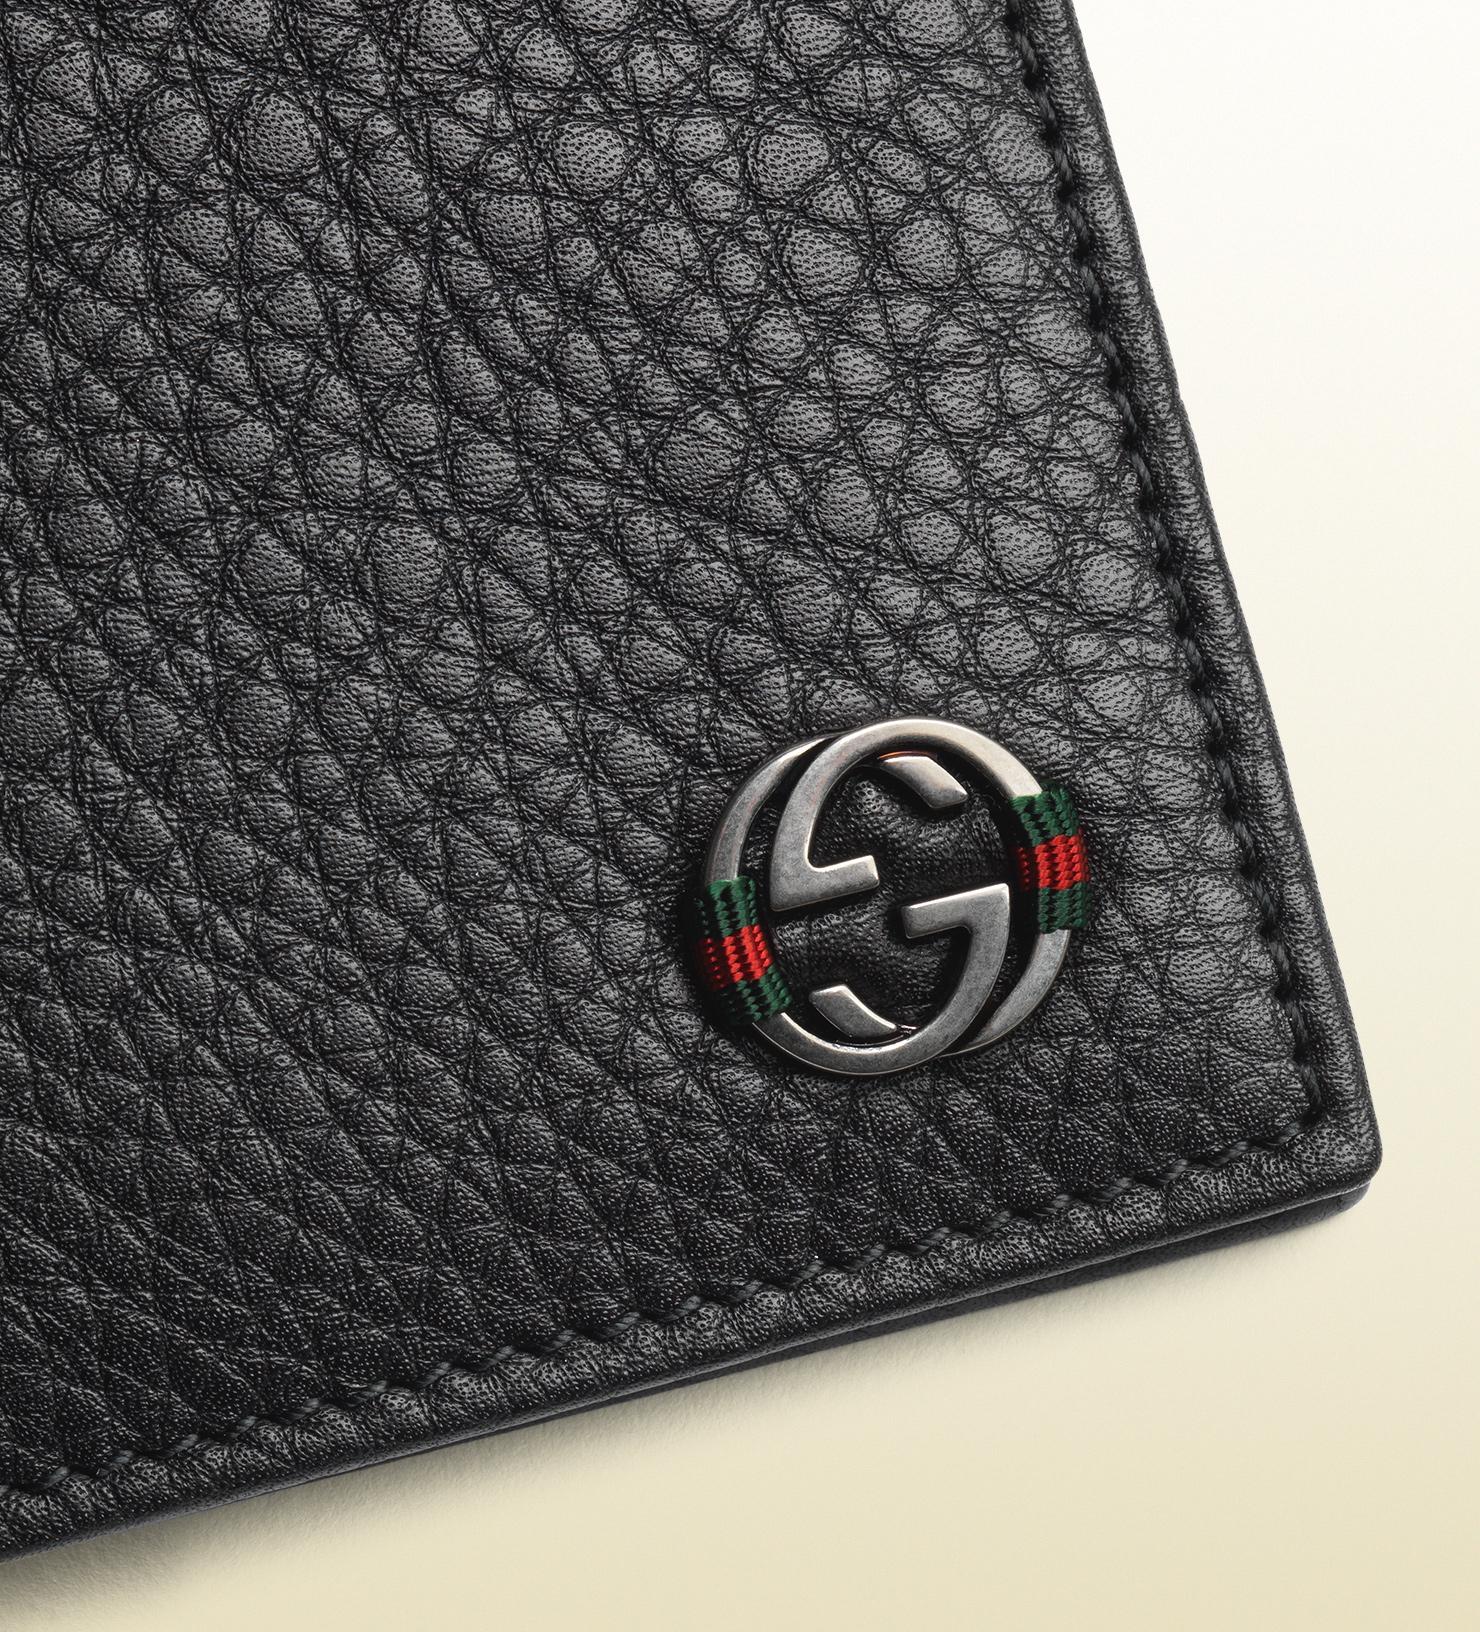 d3fab62d477d Gucci Leather Bi-fold Wallet in Black for Men - Lyst